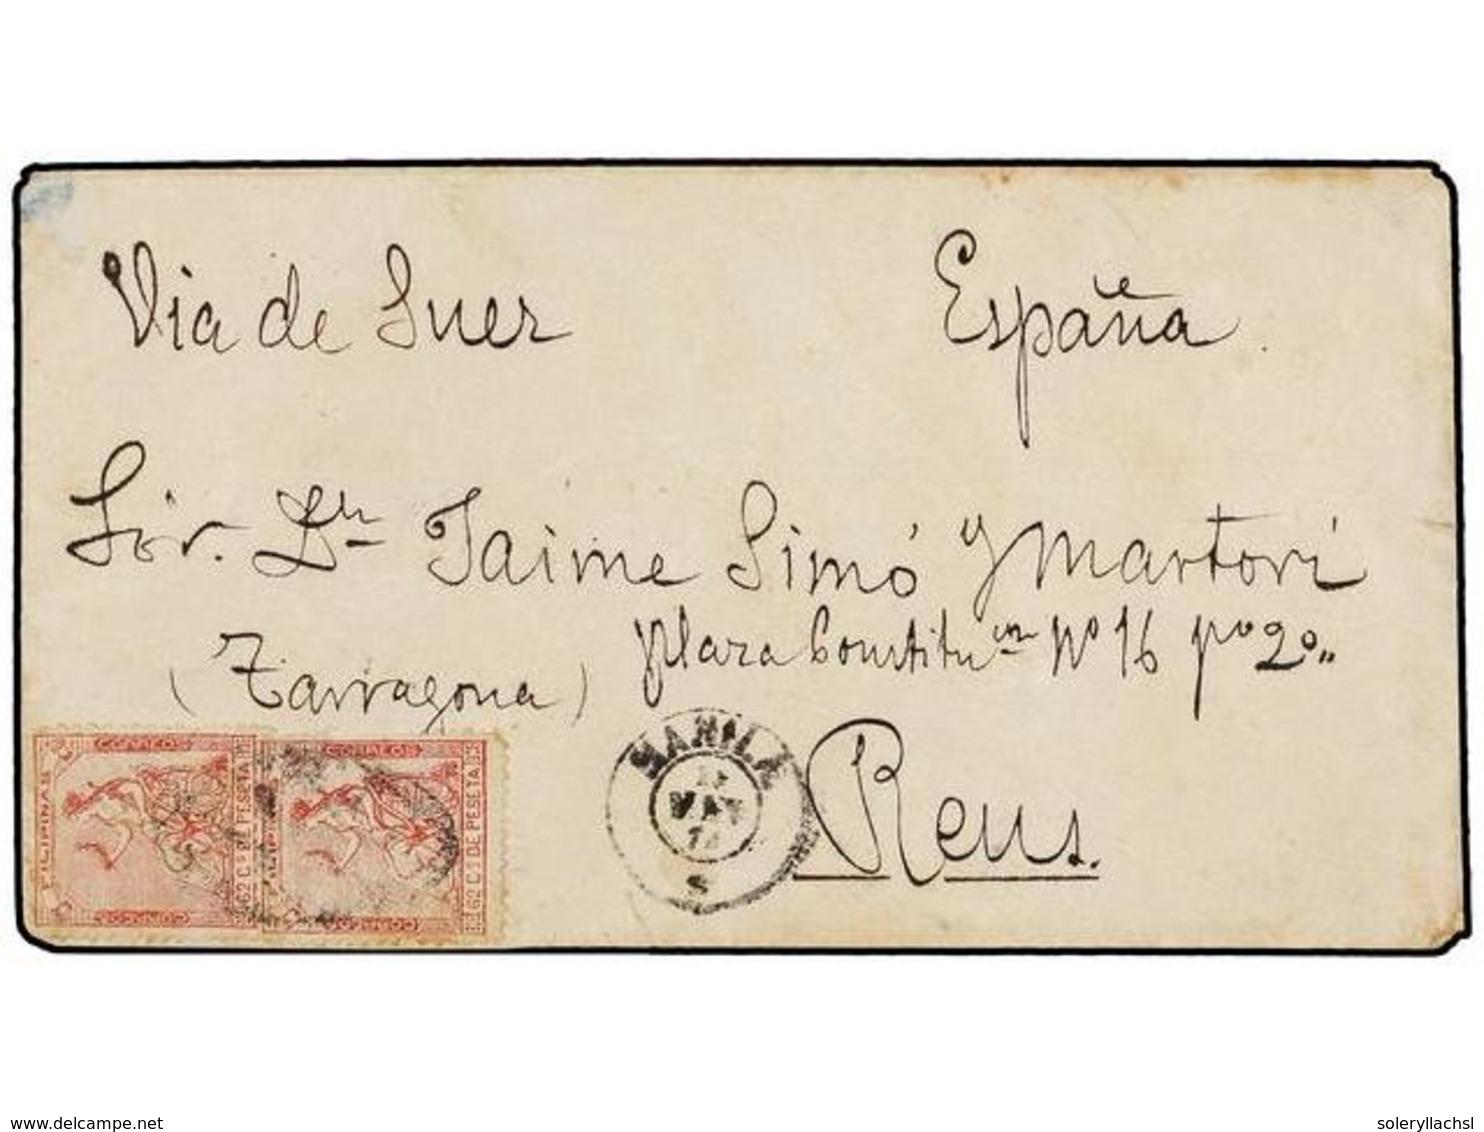 FILIPINAS. Ed.32 (2). 1874. MANILA A ESPAÑA. 62 Cts. Rojo (2), Mat. PARRILLA COLONIAL Y Fechador MANILA/*.  Al Dorso Lle - Non Classés